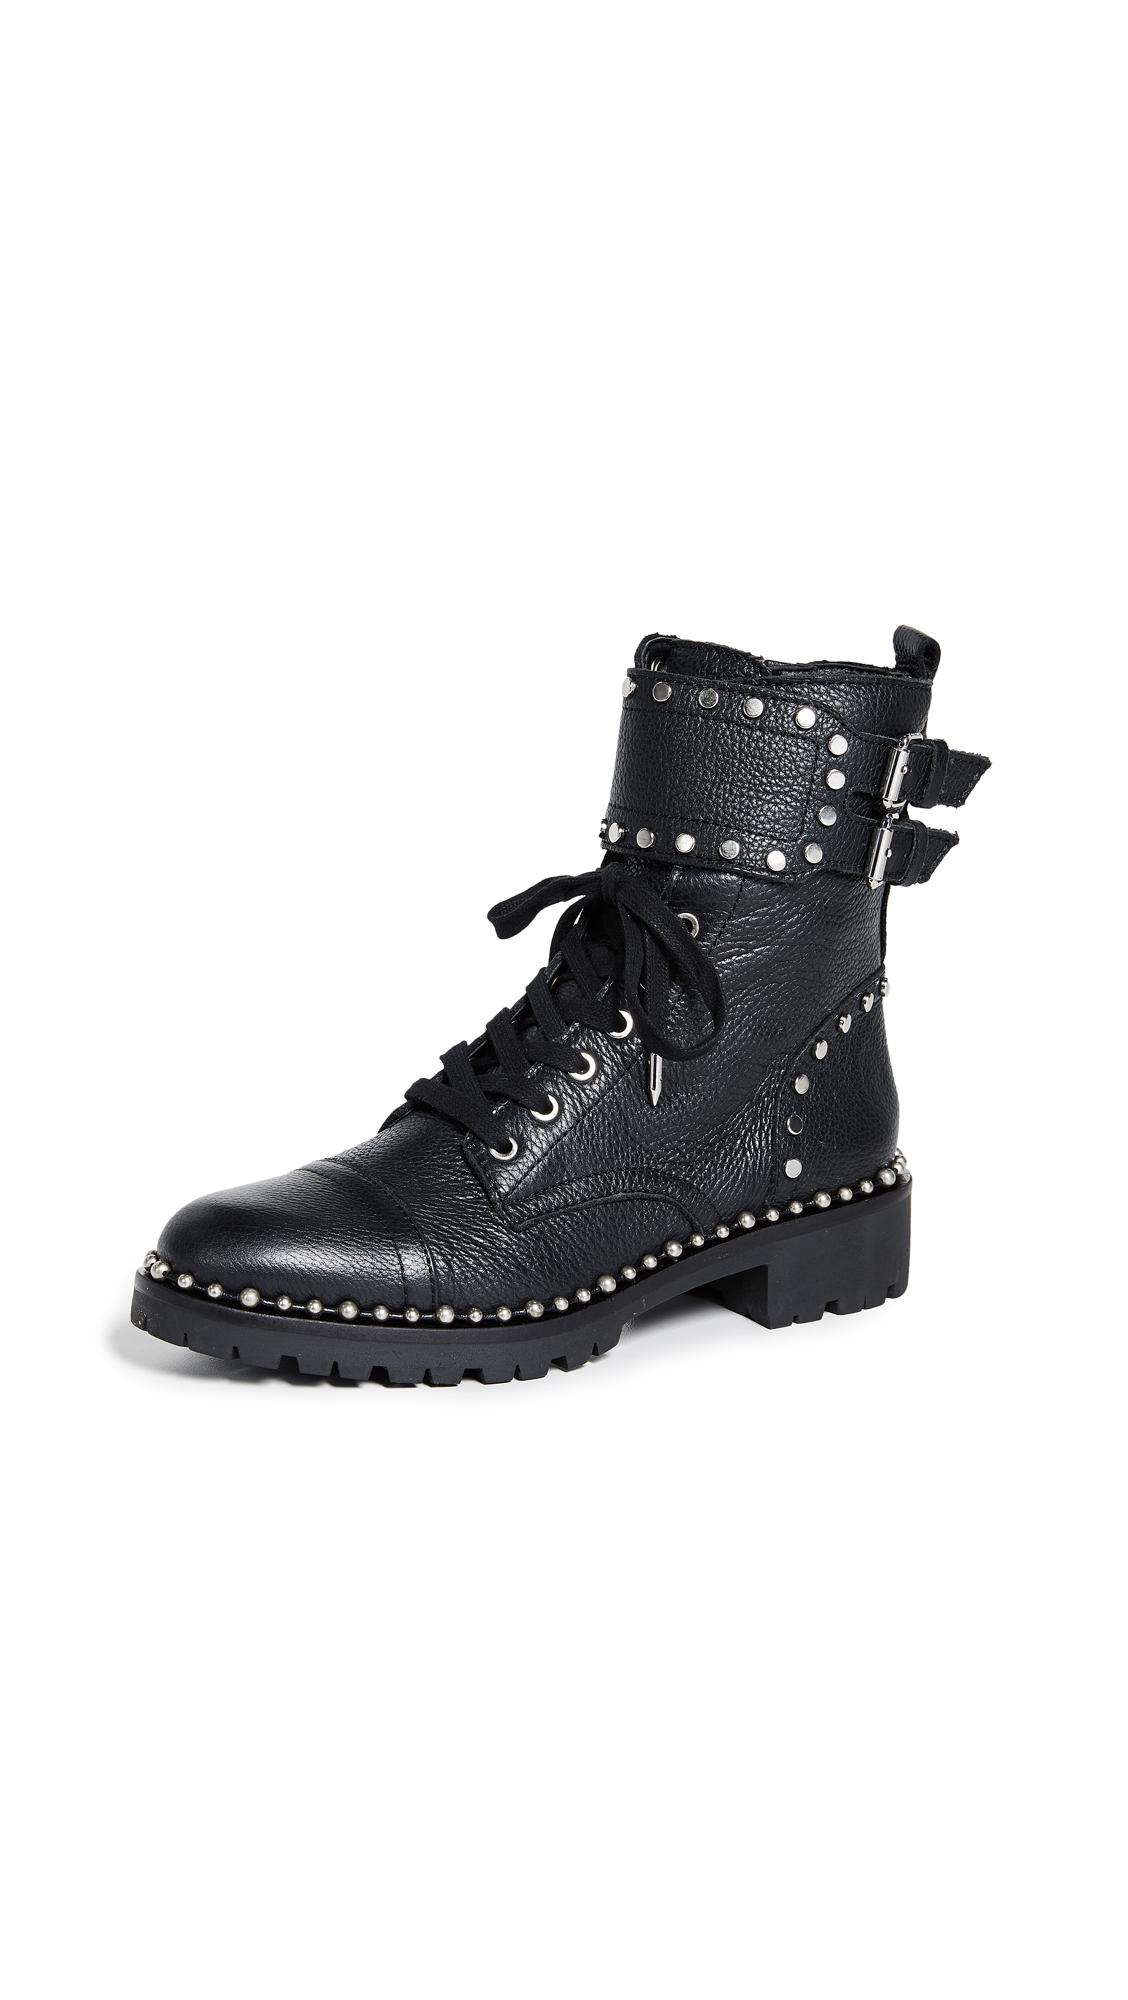 64196e134 Sam Edelman Women. SAM EDELMAN. Women s Jennifer Studded Leather Combat  Booties in Black